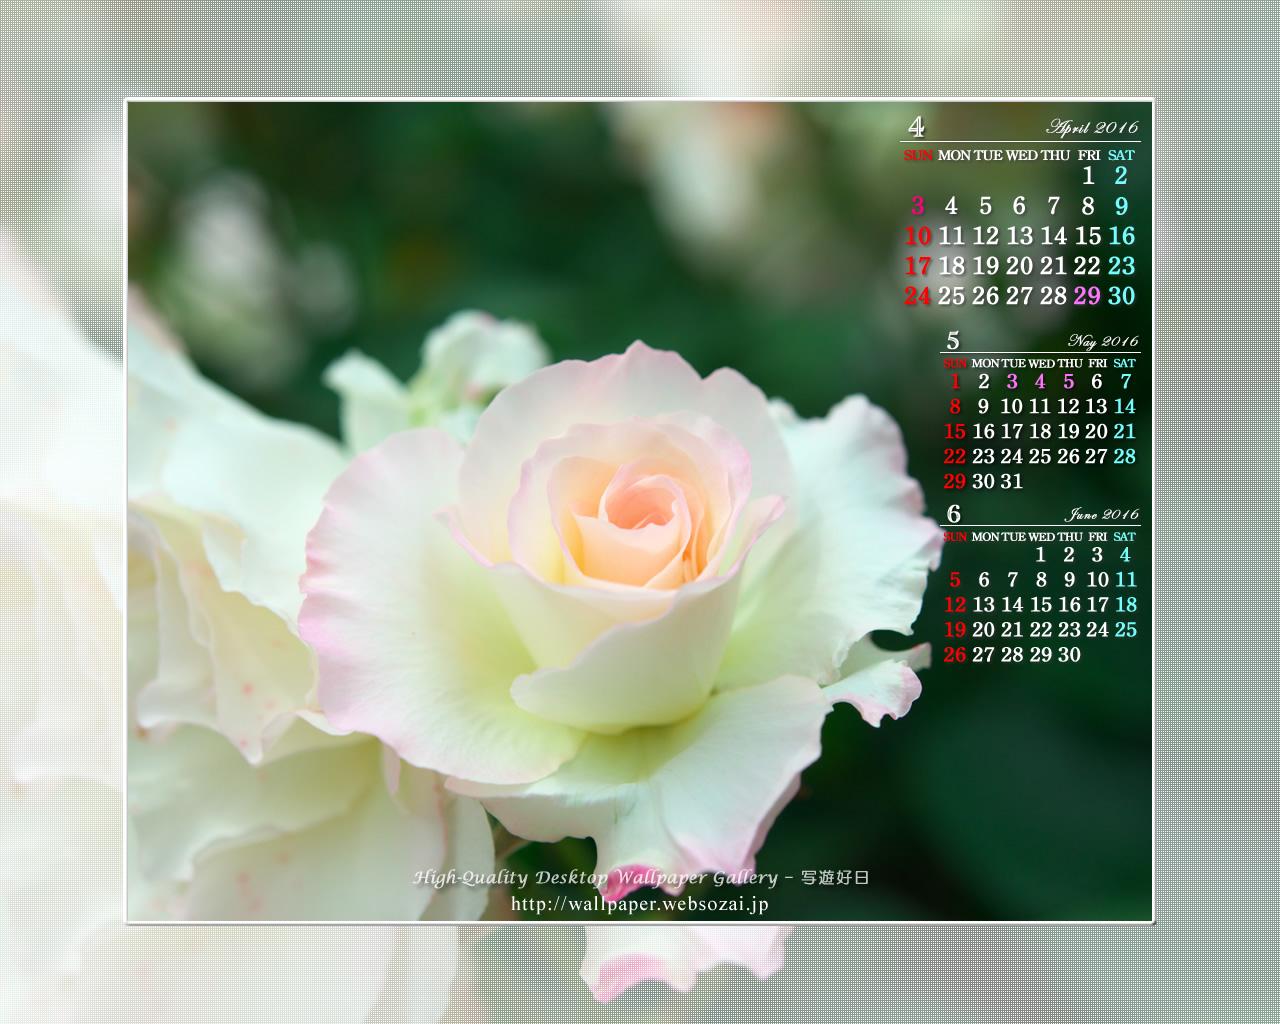 1280800WXGA 1610 Wide Screen 1280x1024